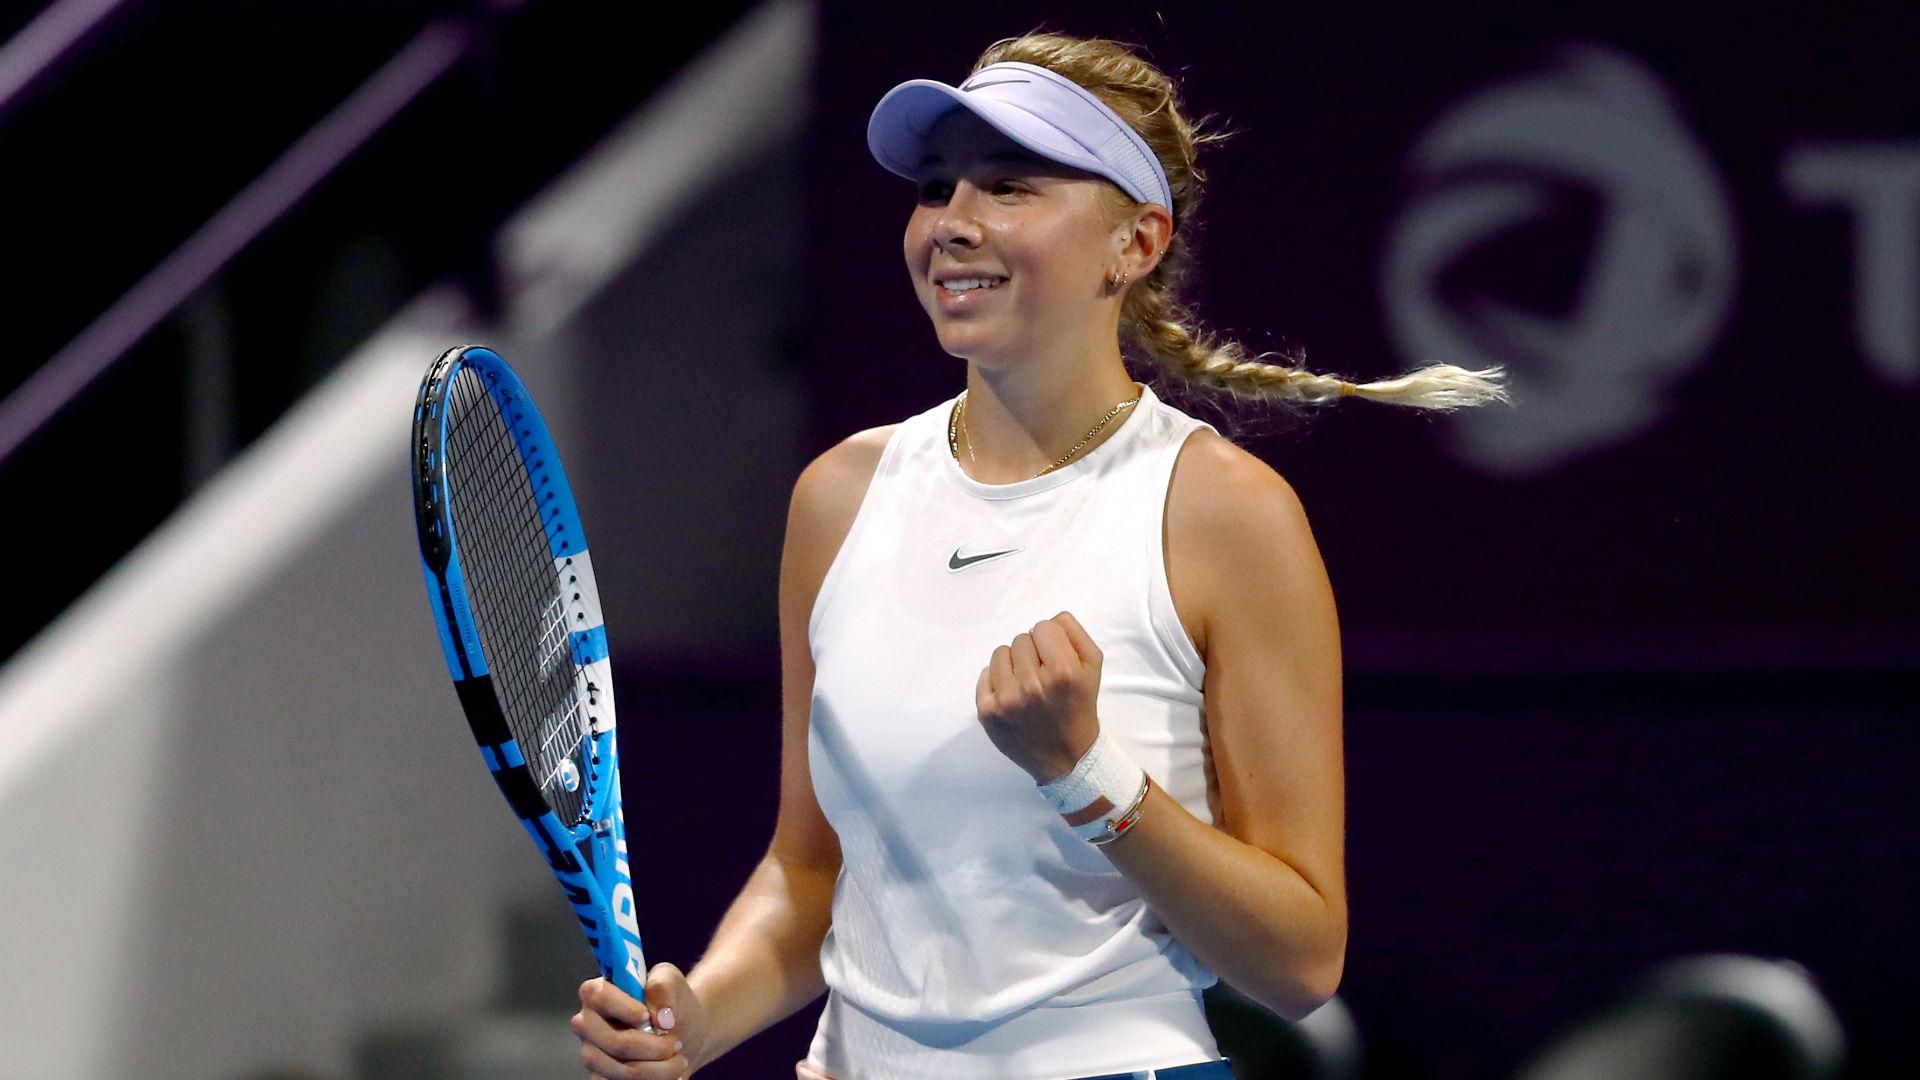 Anisimova knocks out struggling Svitolina as seeds fall in Doha